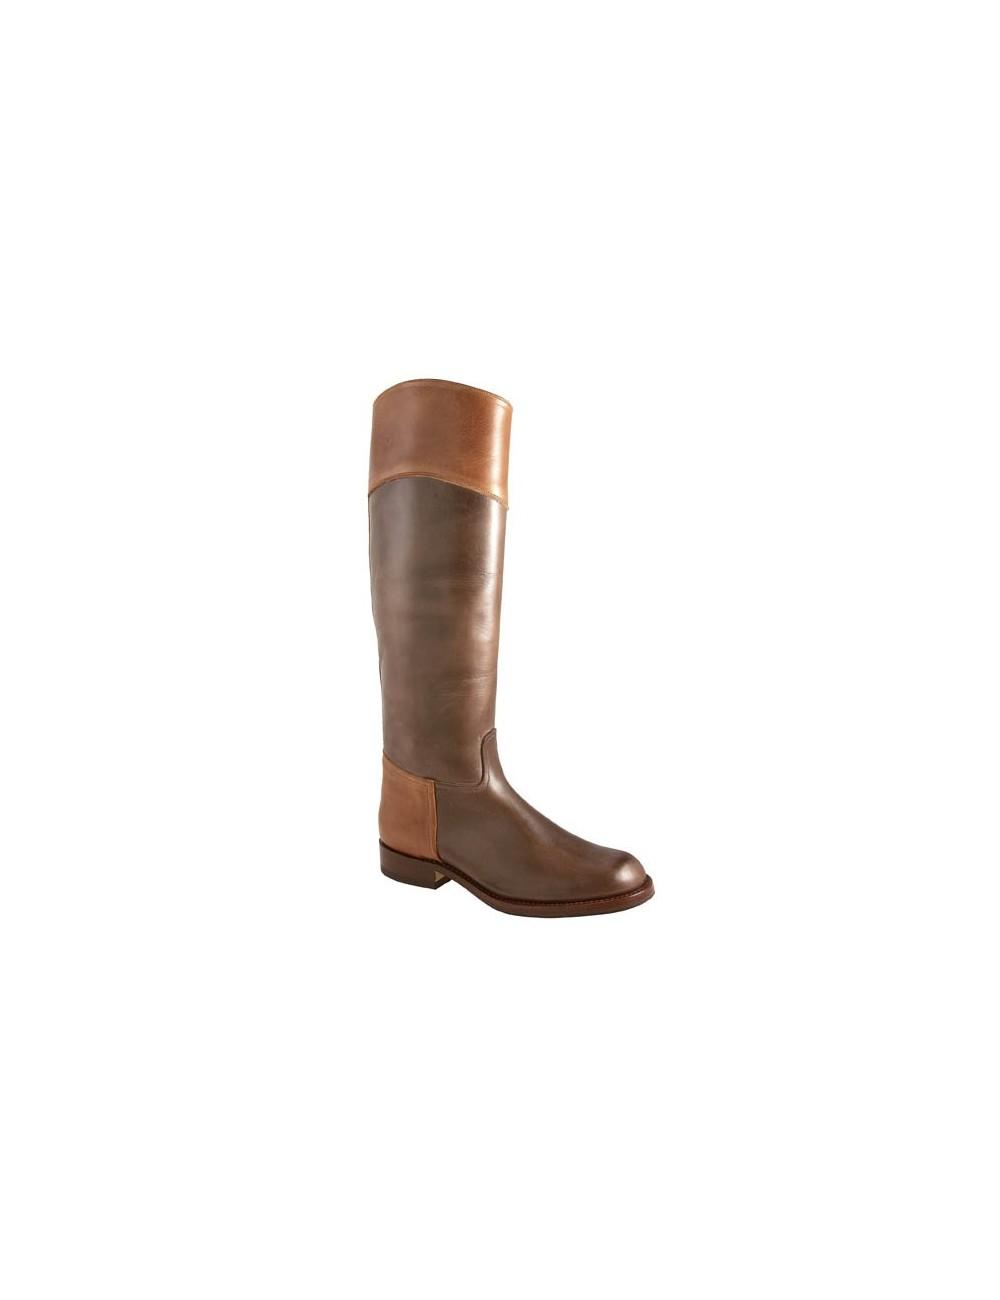 marron bicolore mesure cuir Bottes cavalières sur lFK1JTc